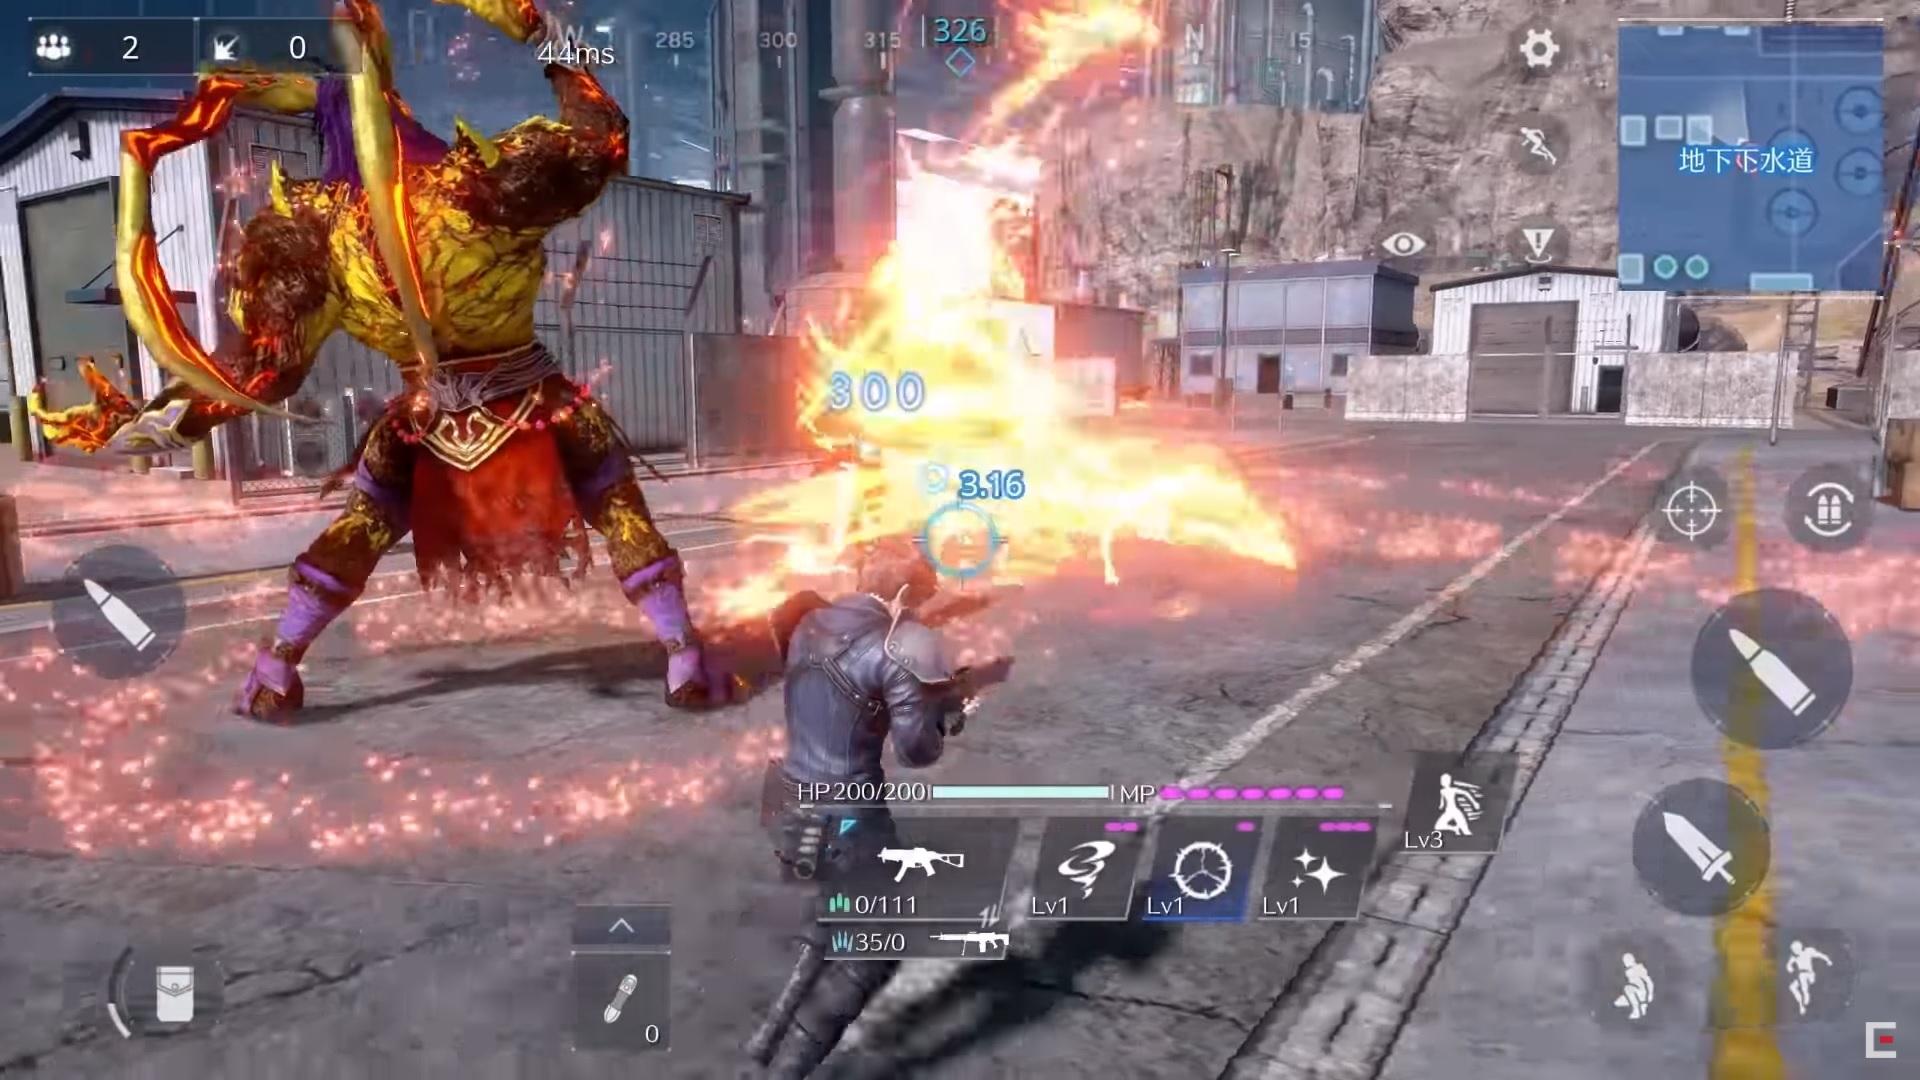 Permainan battle royale Final Fantasy VII: The First Soldier diumumkan